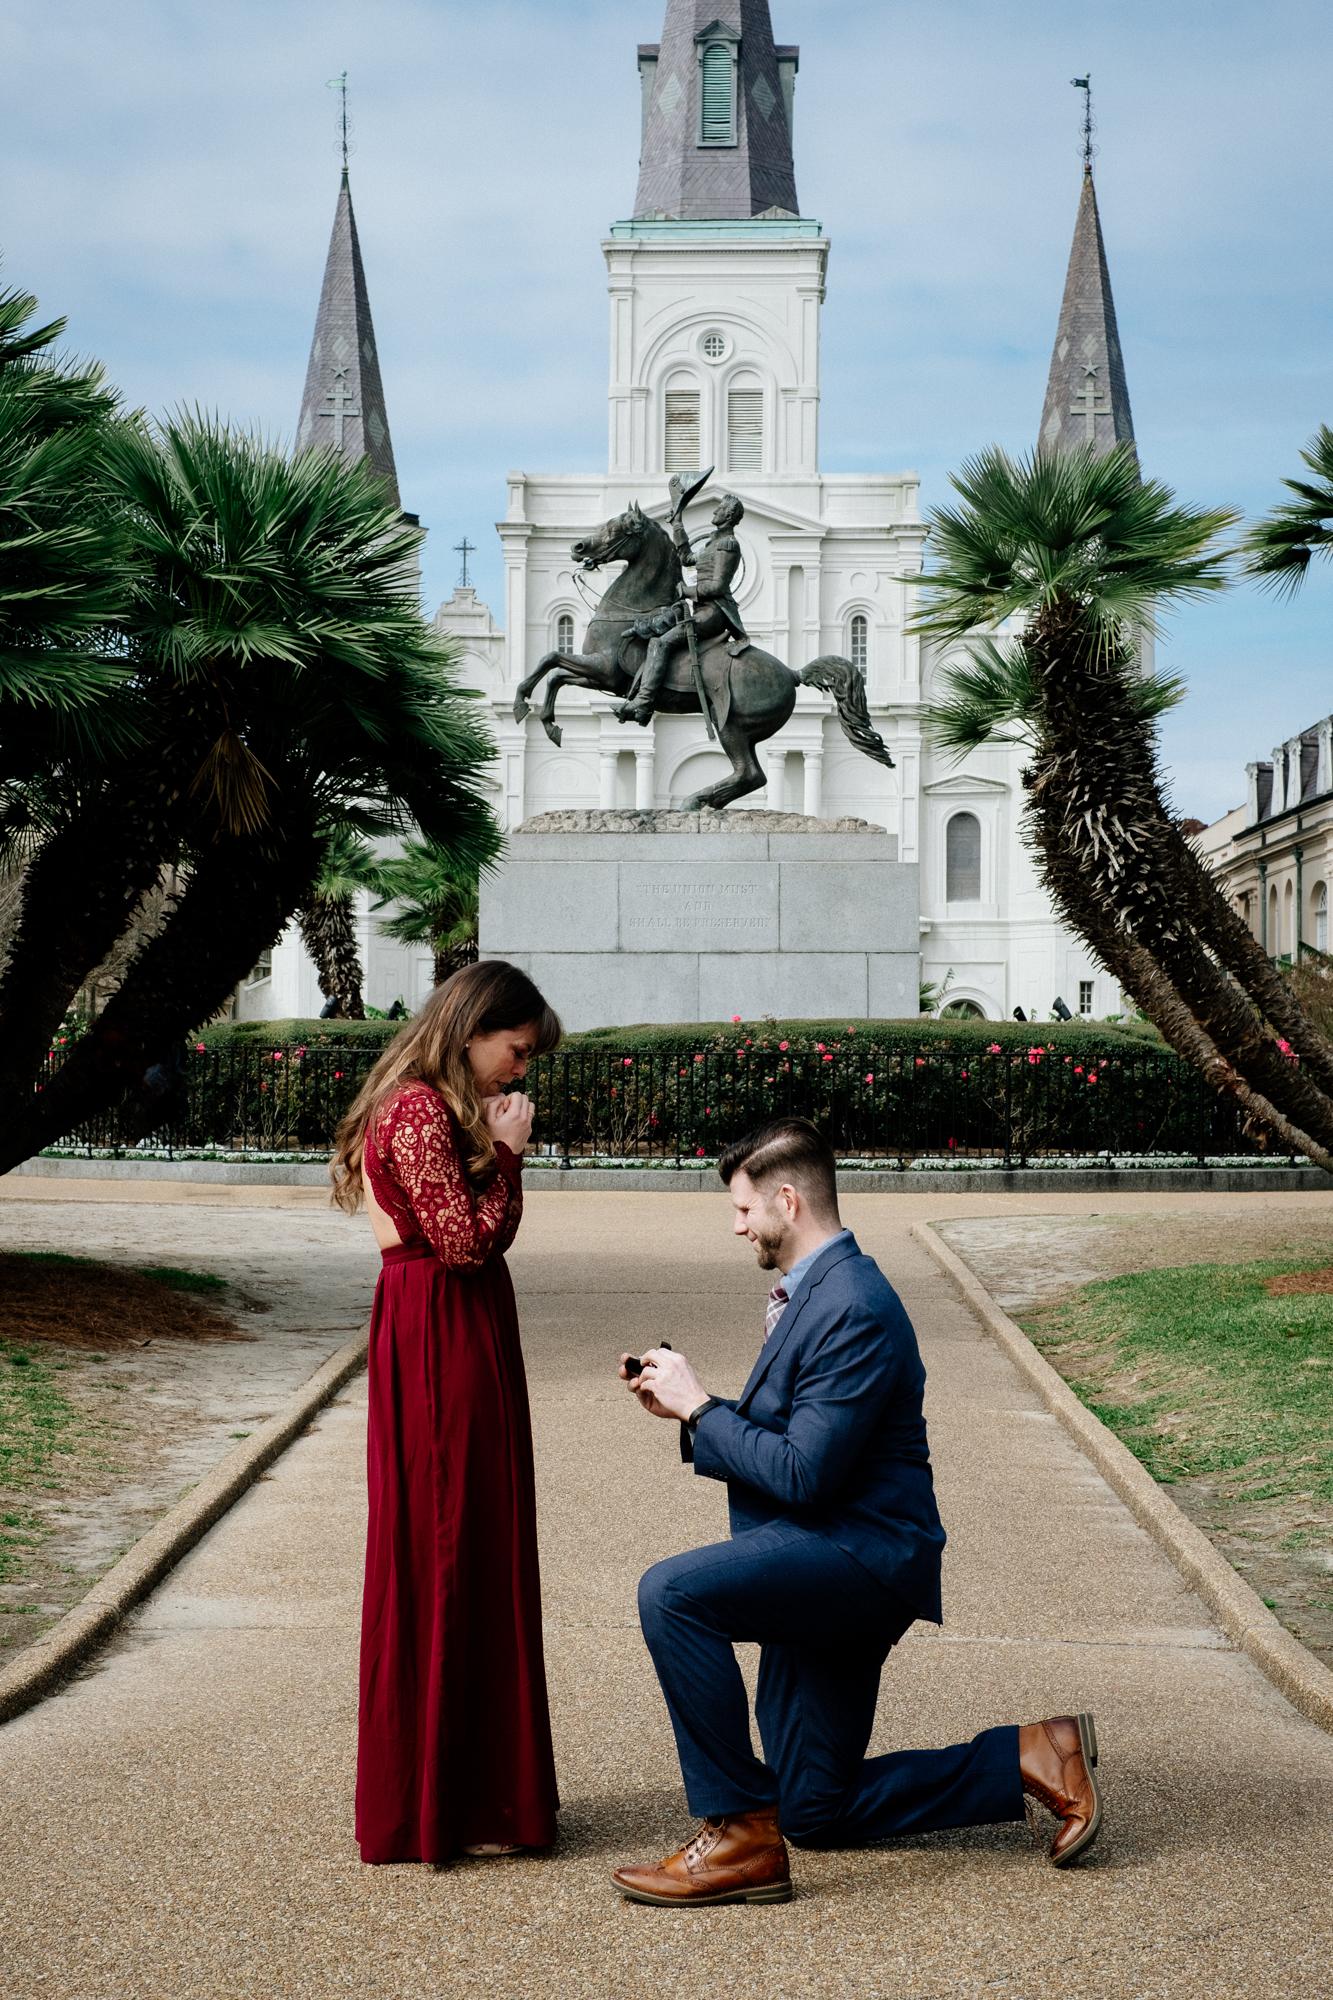 Jen_Montgomery_Photography_Angela_Brian_Engagement_Proposal_FB-10.jpg